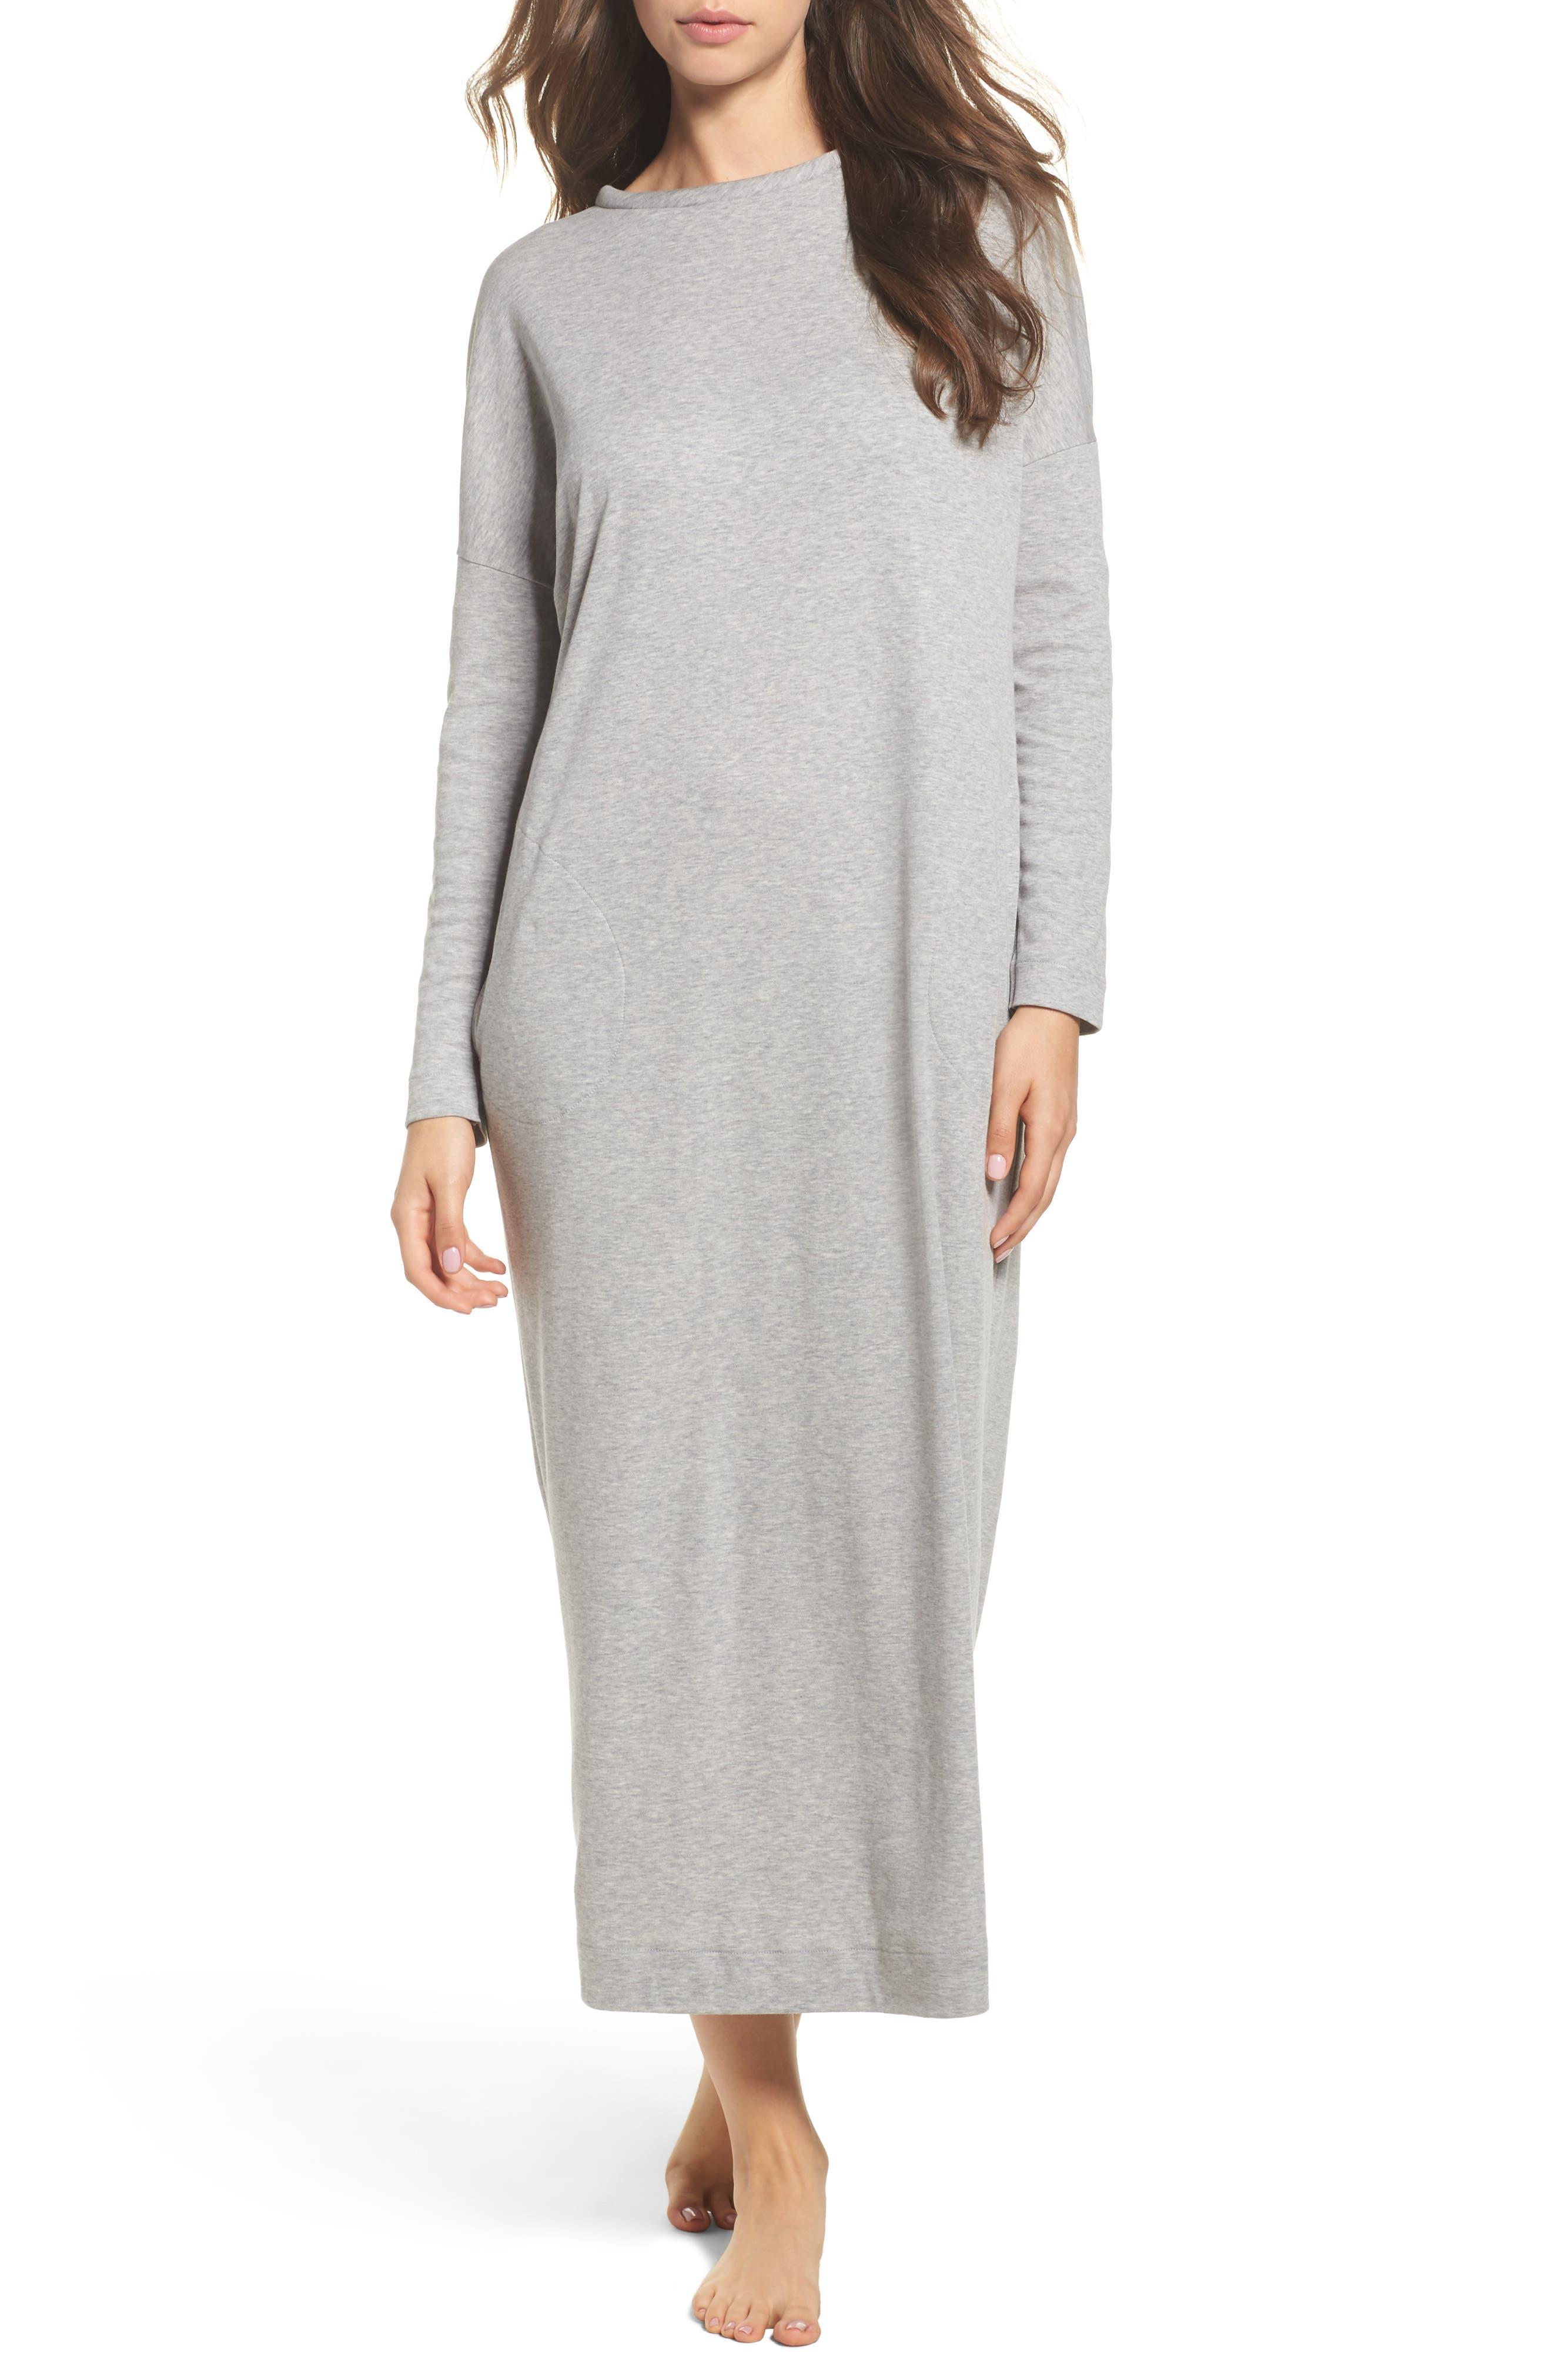 Enie Cotton Nightgown,                         Main,                         color, 020